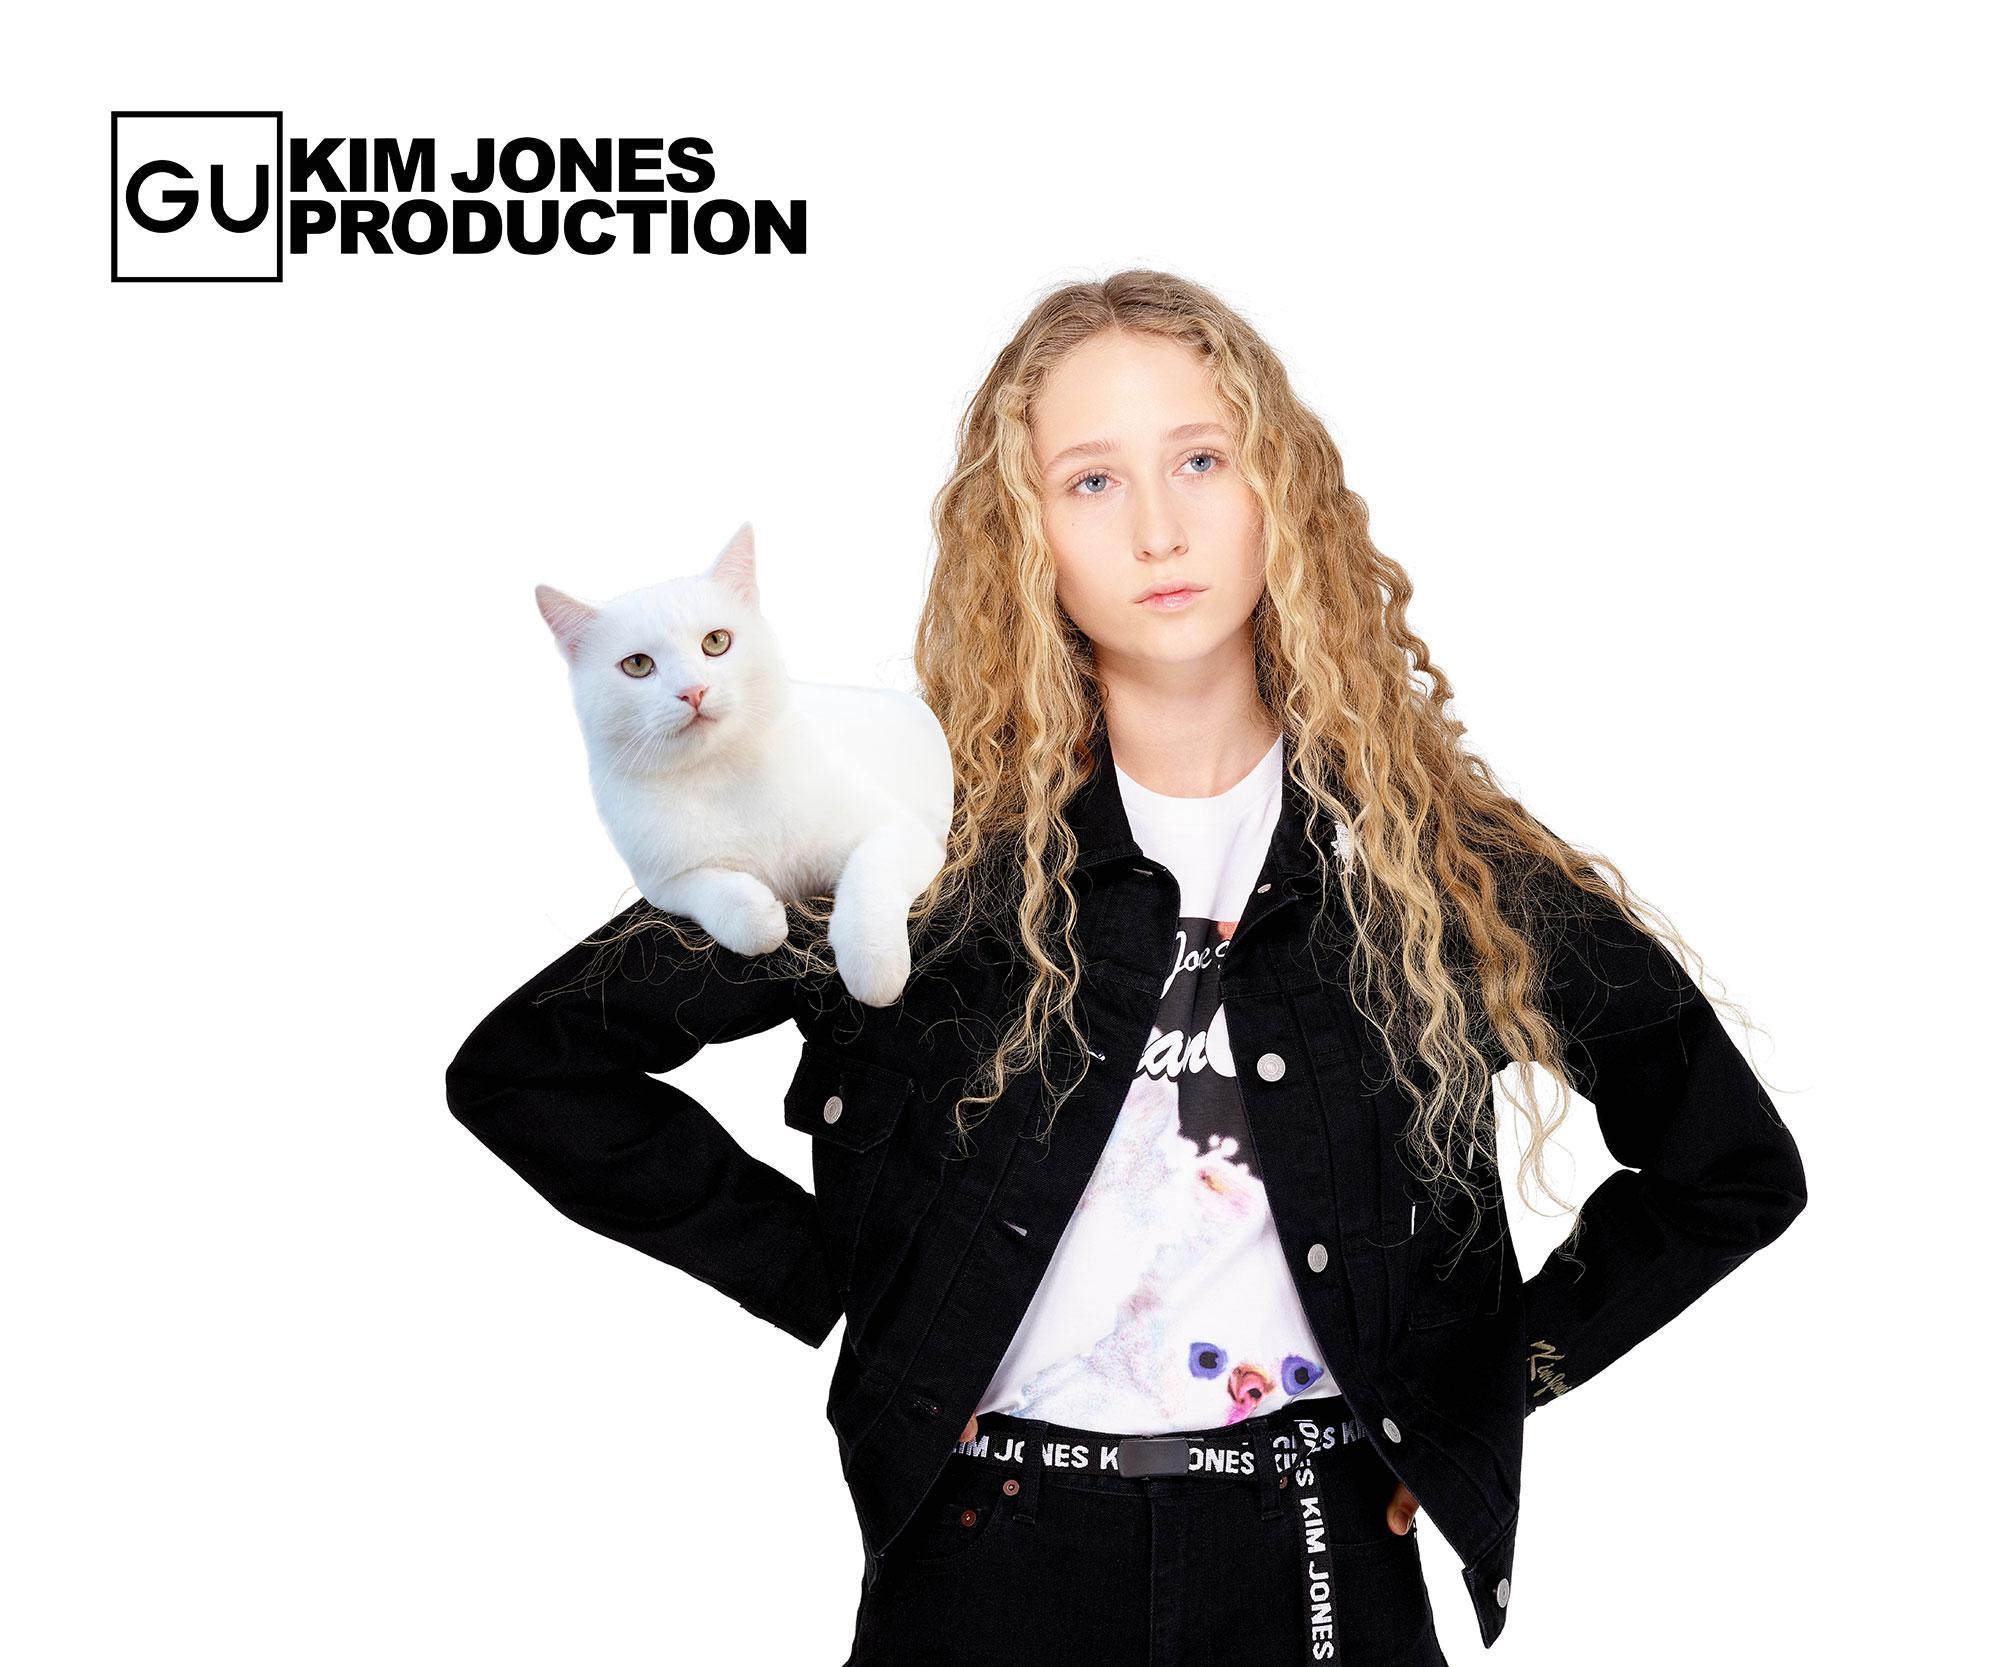 「KIM JONES GU PRODUCTION」